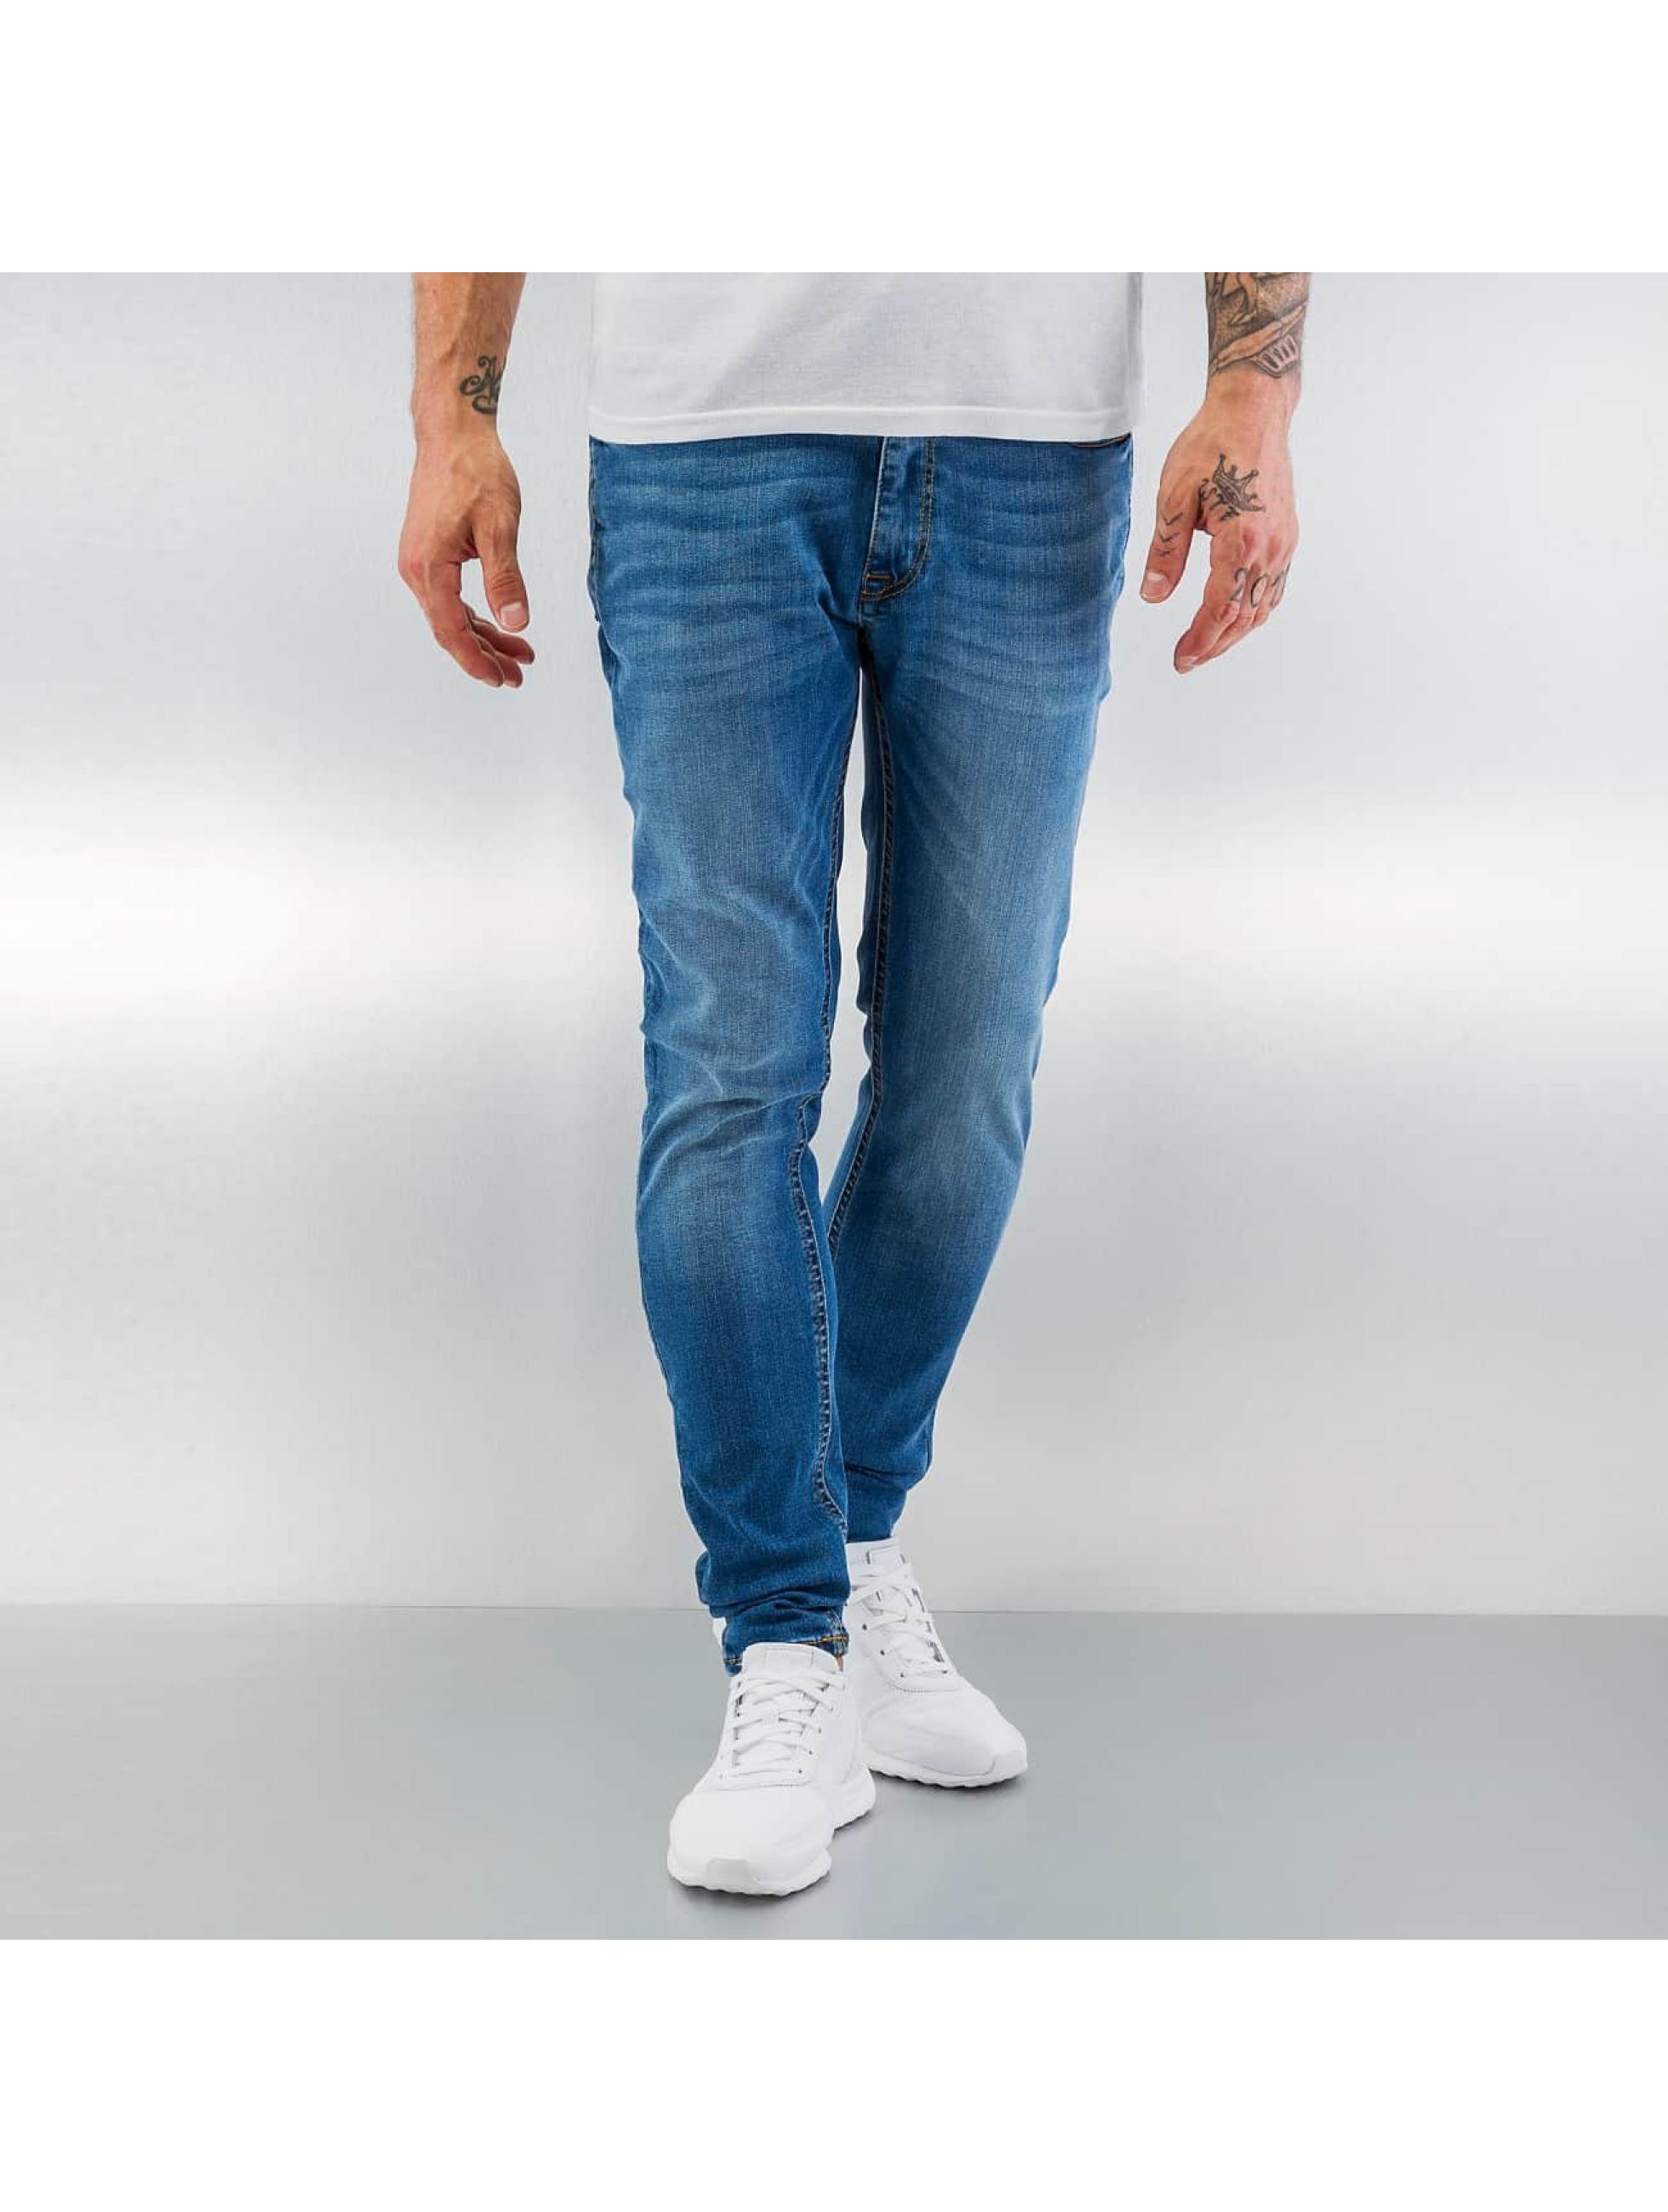 Jack & Jones Skinny Jeans jjiLiam jjOriginal blau